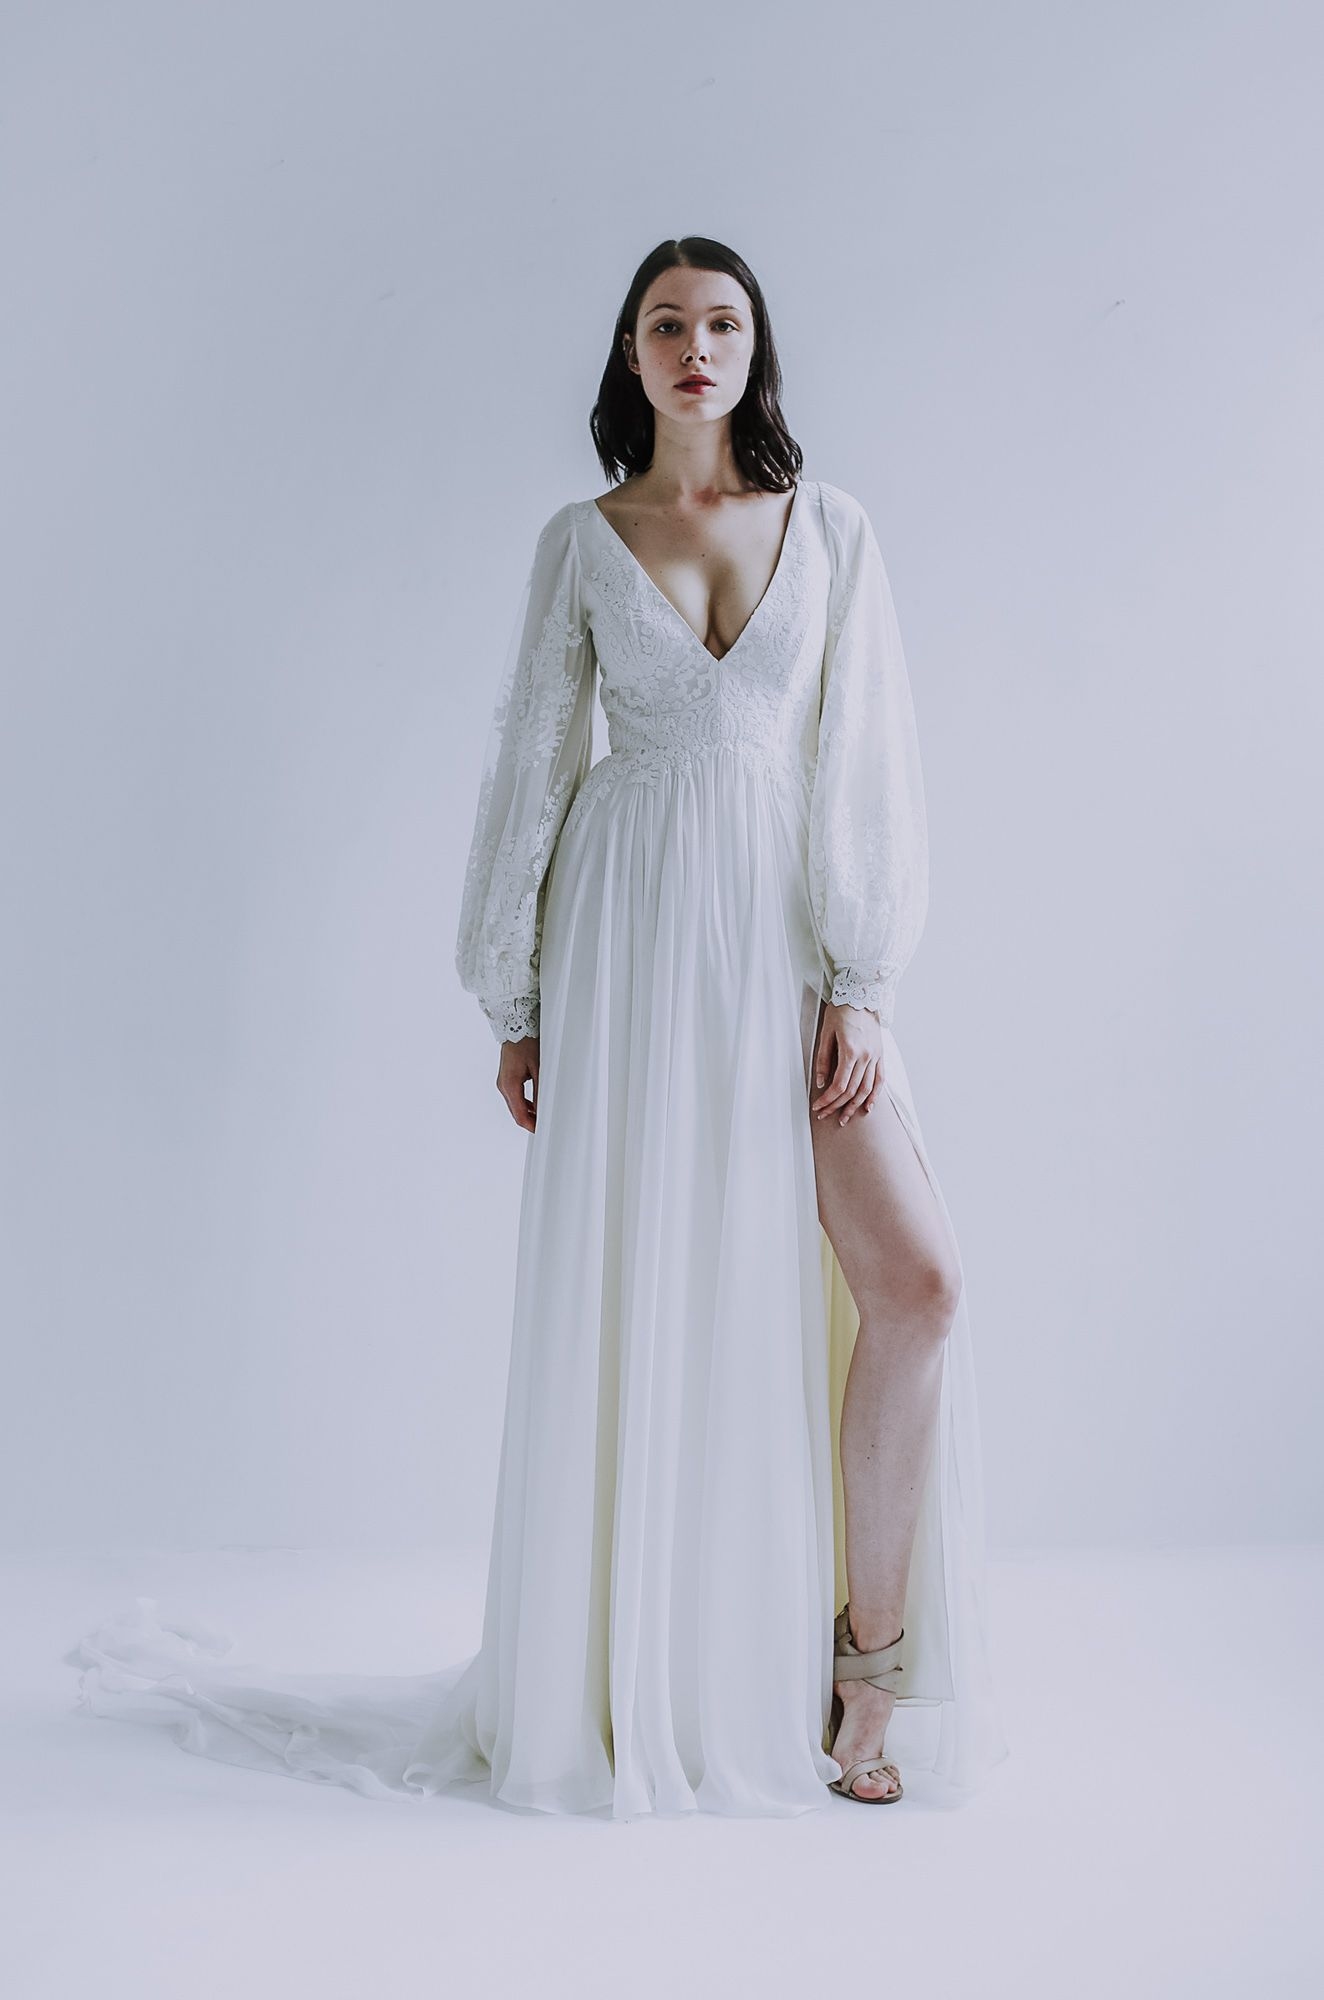 Pascaline Dress Leanne Marshall In 2020 Linen Wedding Dress Dresses Wedding Dresses Simple